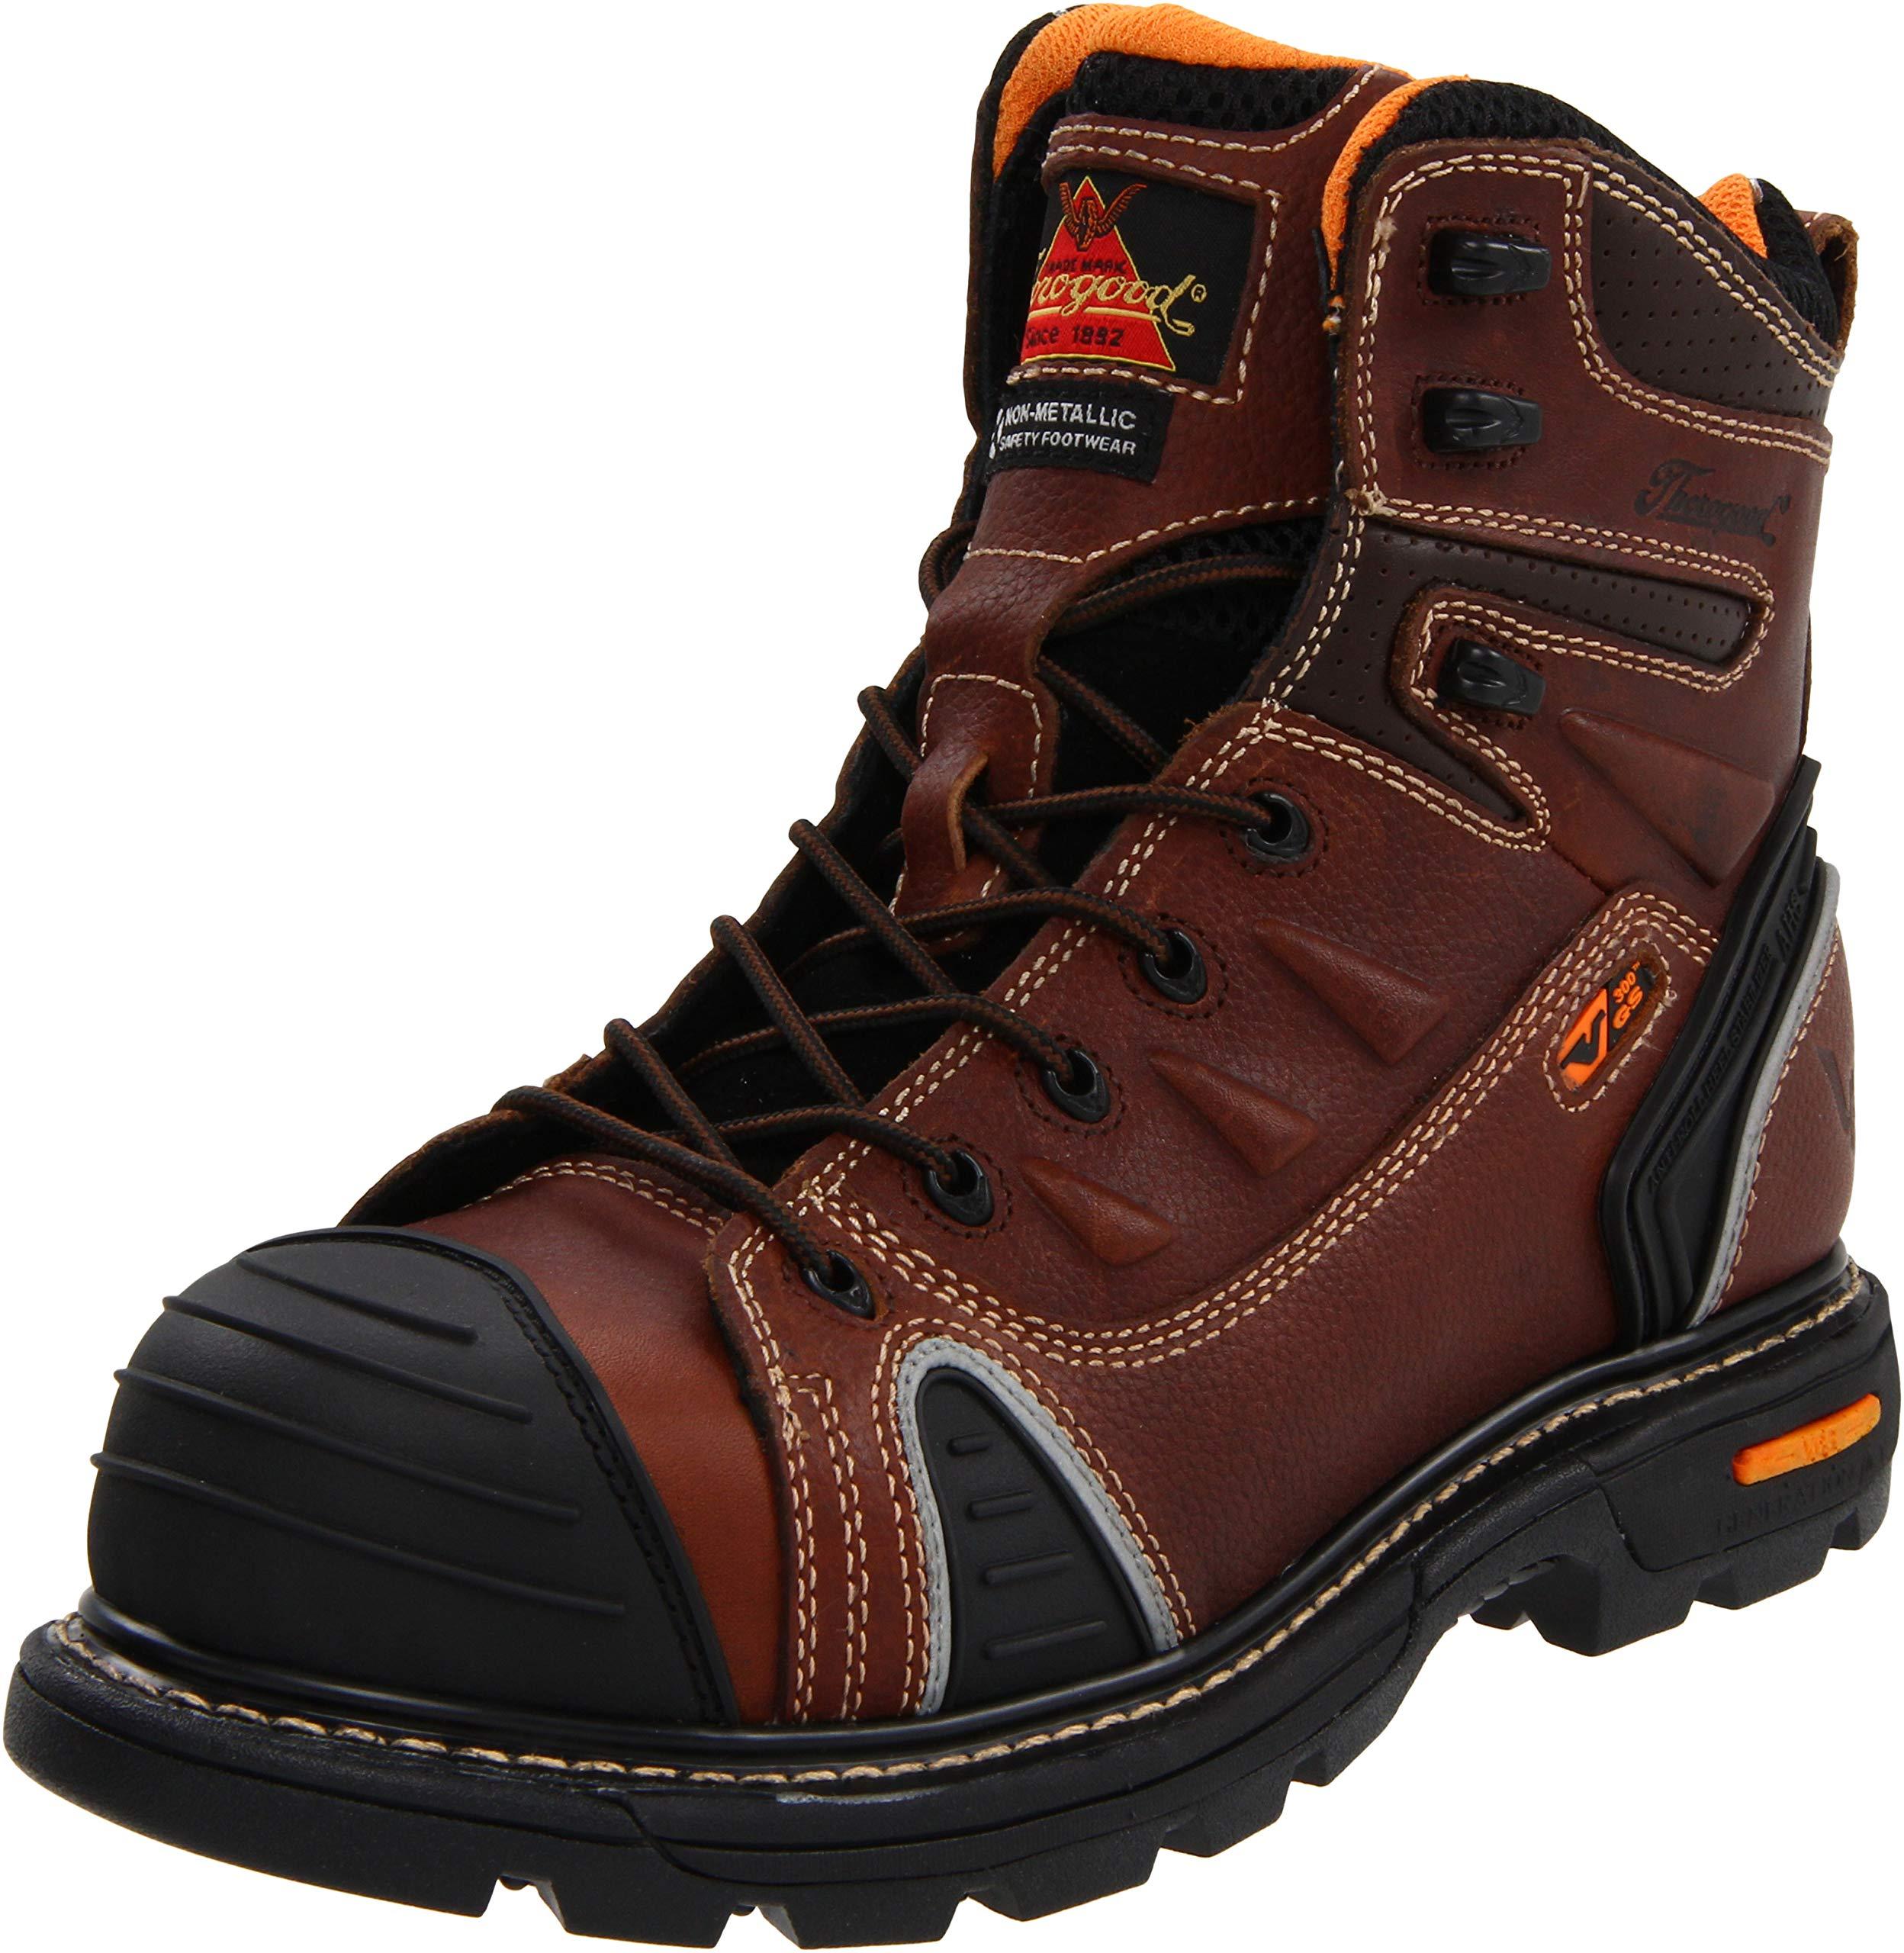 0ea563d8fd9 Thorogood Composite Safety Toe Gen Flex 804-4445 6-Inch Work Boot ...